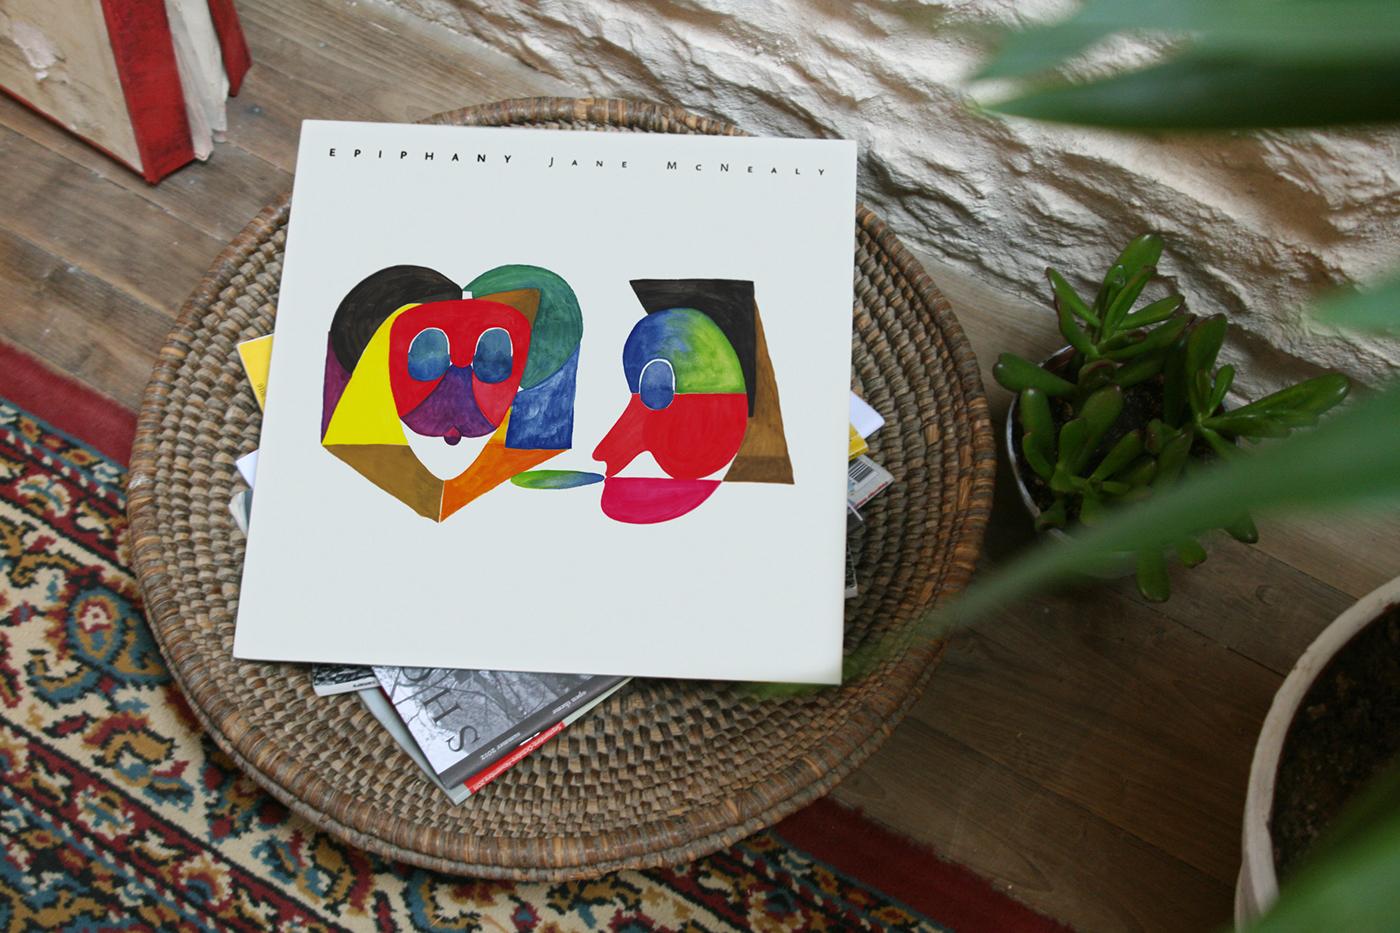 watercolor aquarelle graphisme design cover albumcovers music vinyl cd